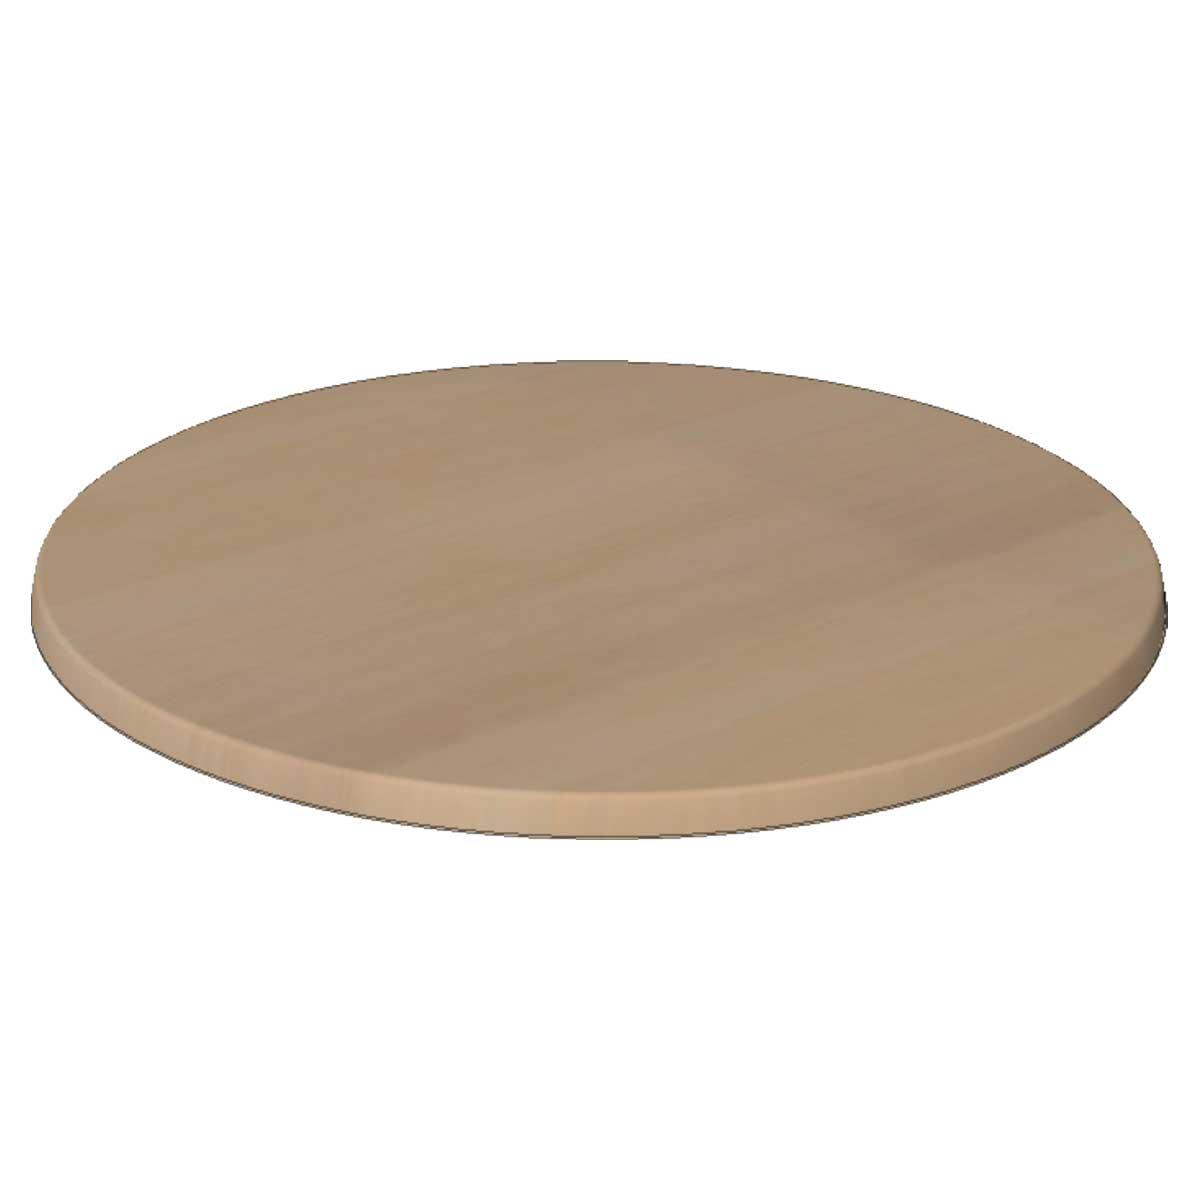 TICLA R70 019 - https://www.werzalit.com/nl/product/tafelblad-classic-werzalit-r-oe120-019-buche-geplankt/